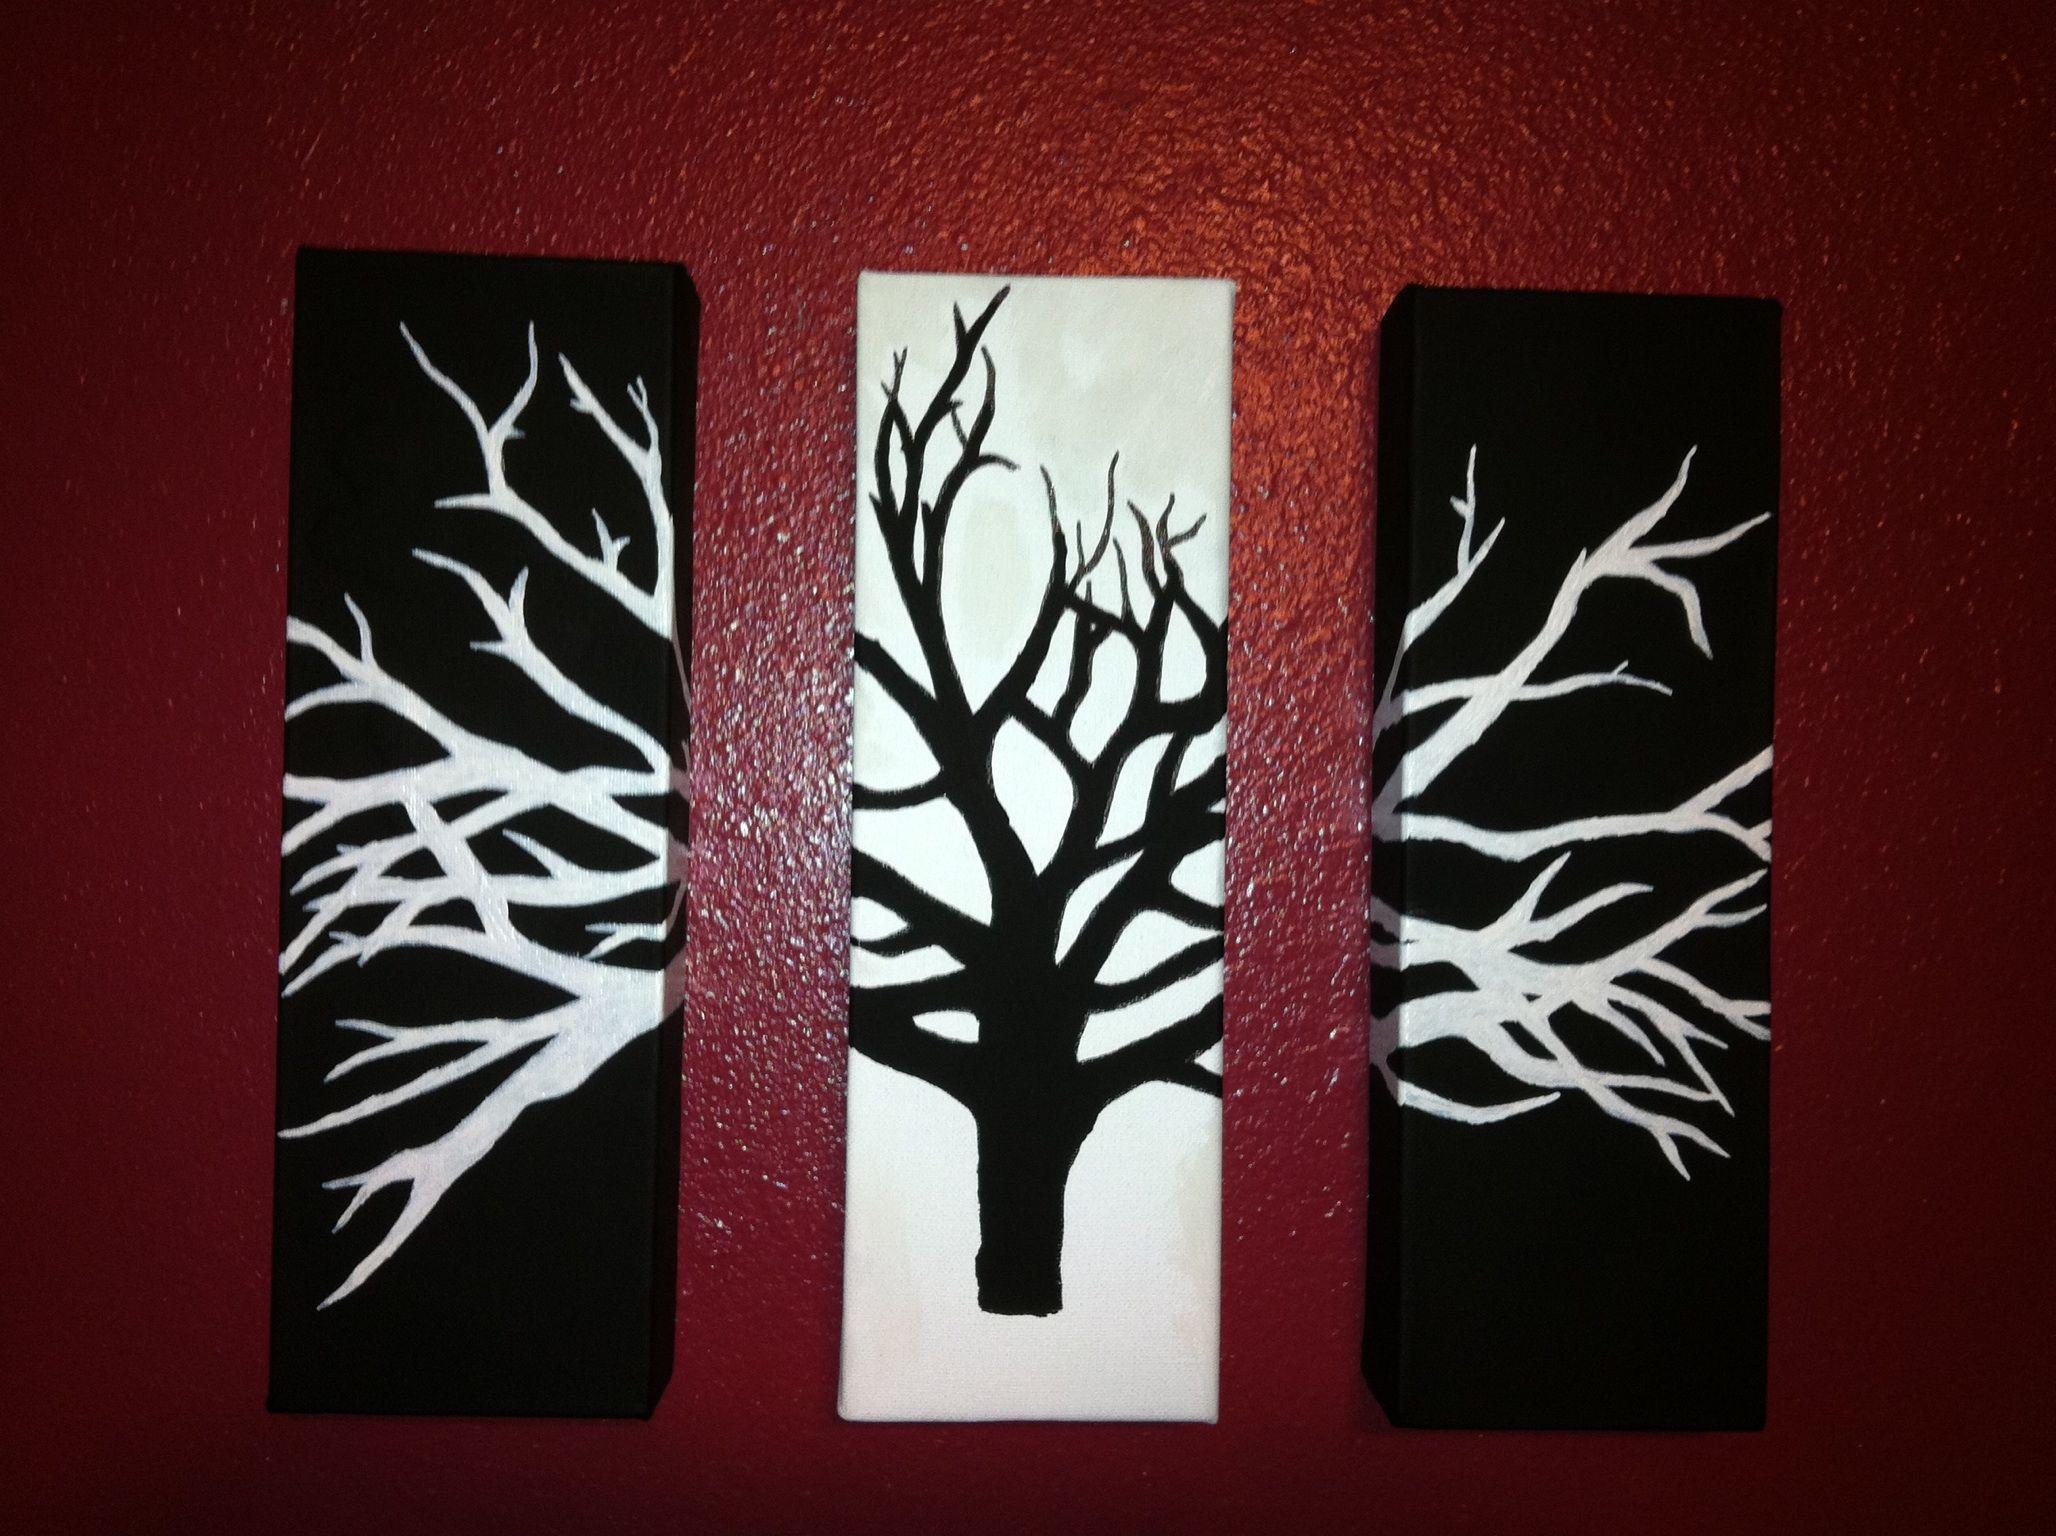 My 3 Piece Black White Tree Art 3 Piece Canvas Art Canvas Painting Designs Canvas Painting Tutorials